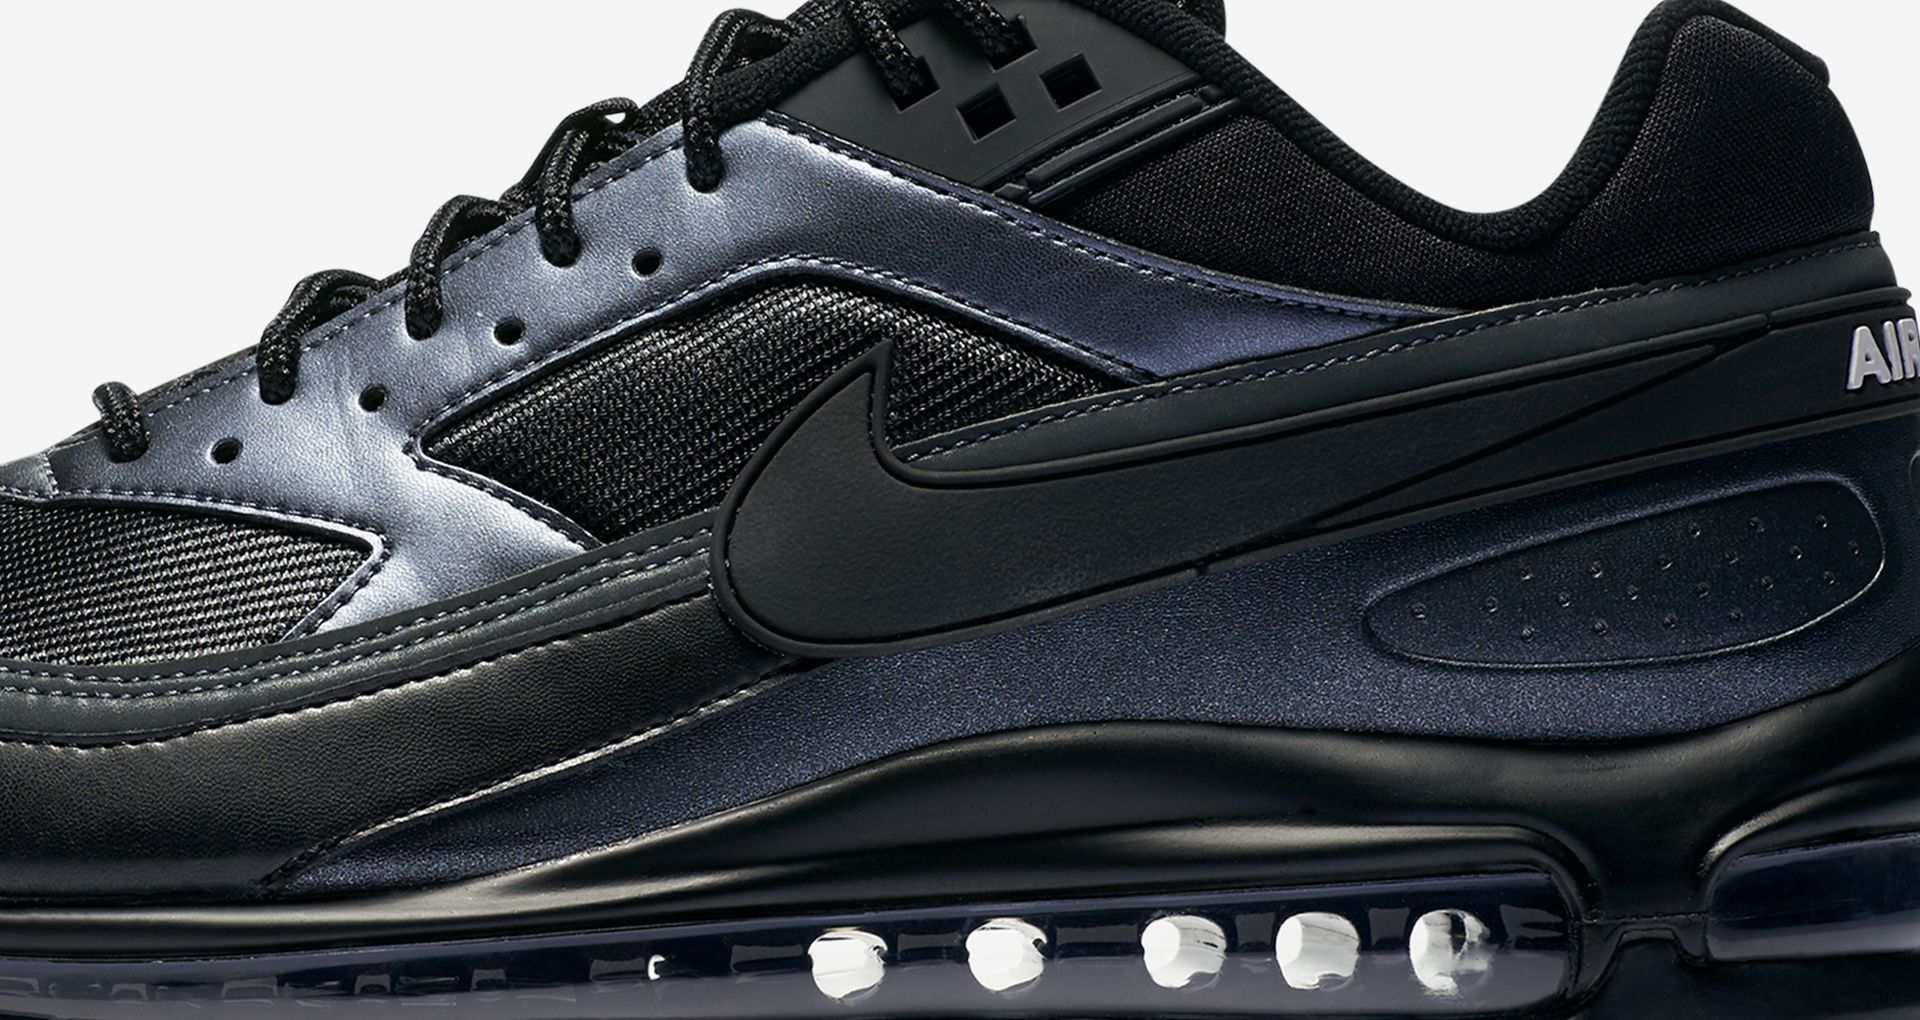 Nike Air Max 97 BW 'Black & Metallic Hematite' Release Date